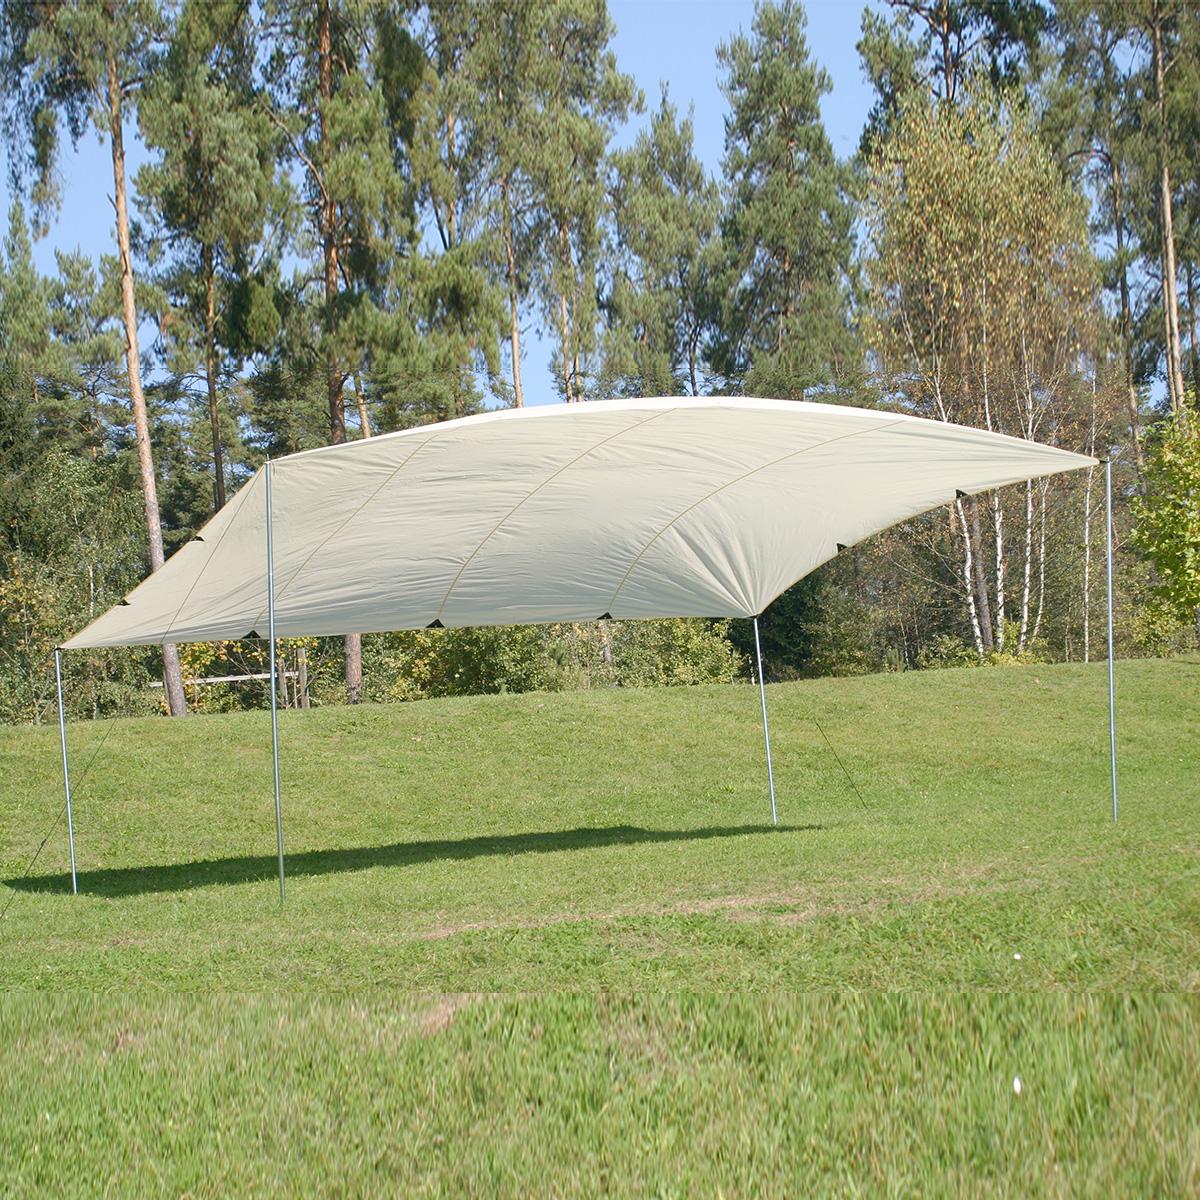 montis lake gro es sonnensegel wei ca 4x5m 4 4kg ebay. Black Bedroom Furniture Sets. Home Design Ideas